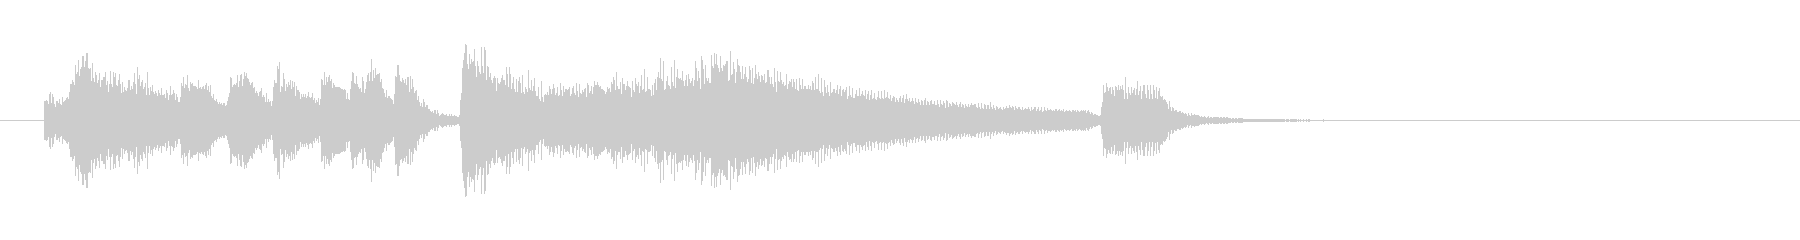 #2 END funny piano CODAの未再生の波形